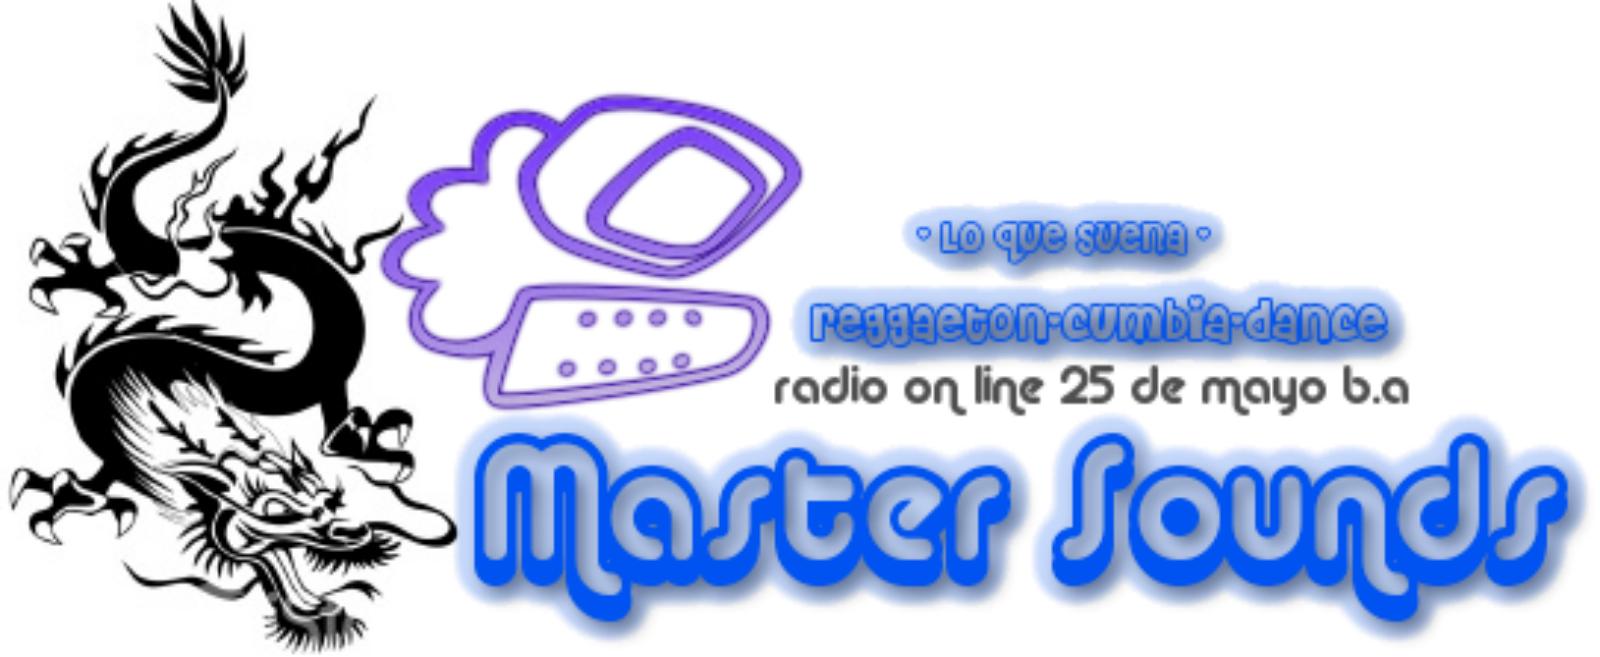 visit MasterSounds.mp3